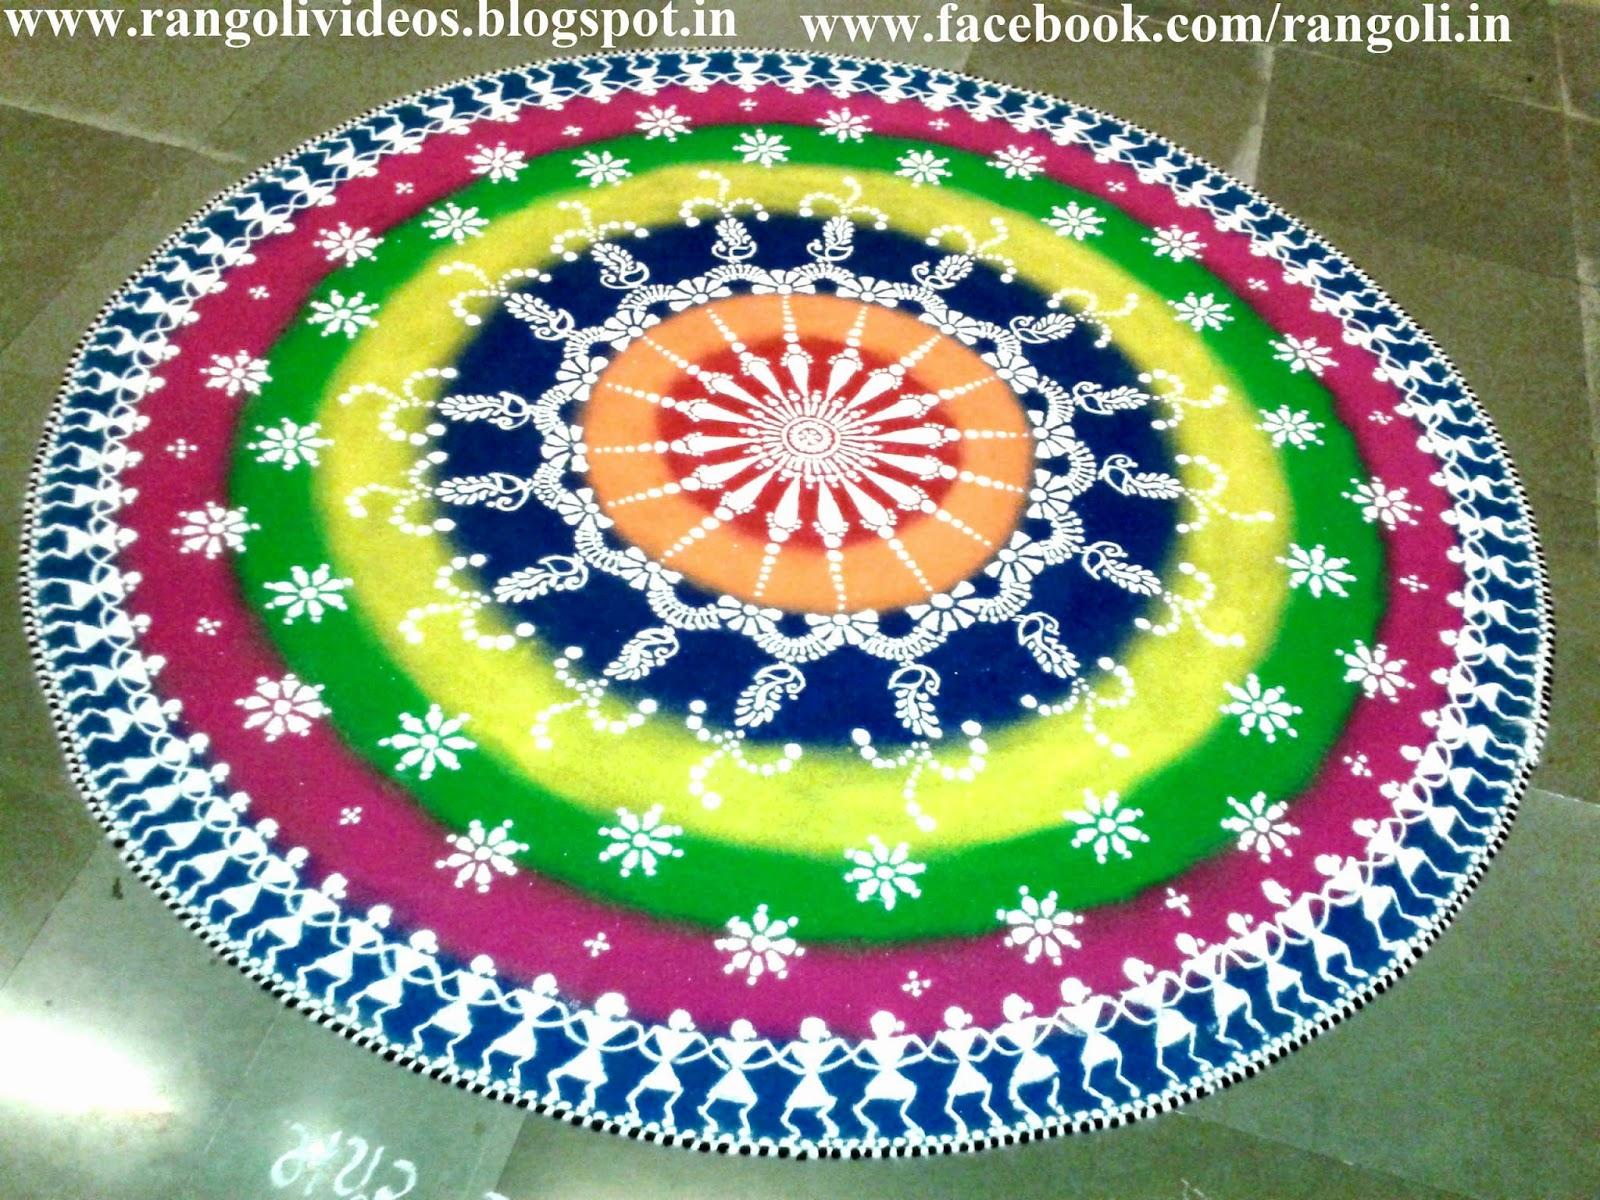 Diwali rangoli kolam designs images diwali rangoli 2013 for Home rangoli designs